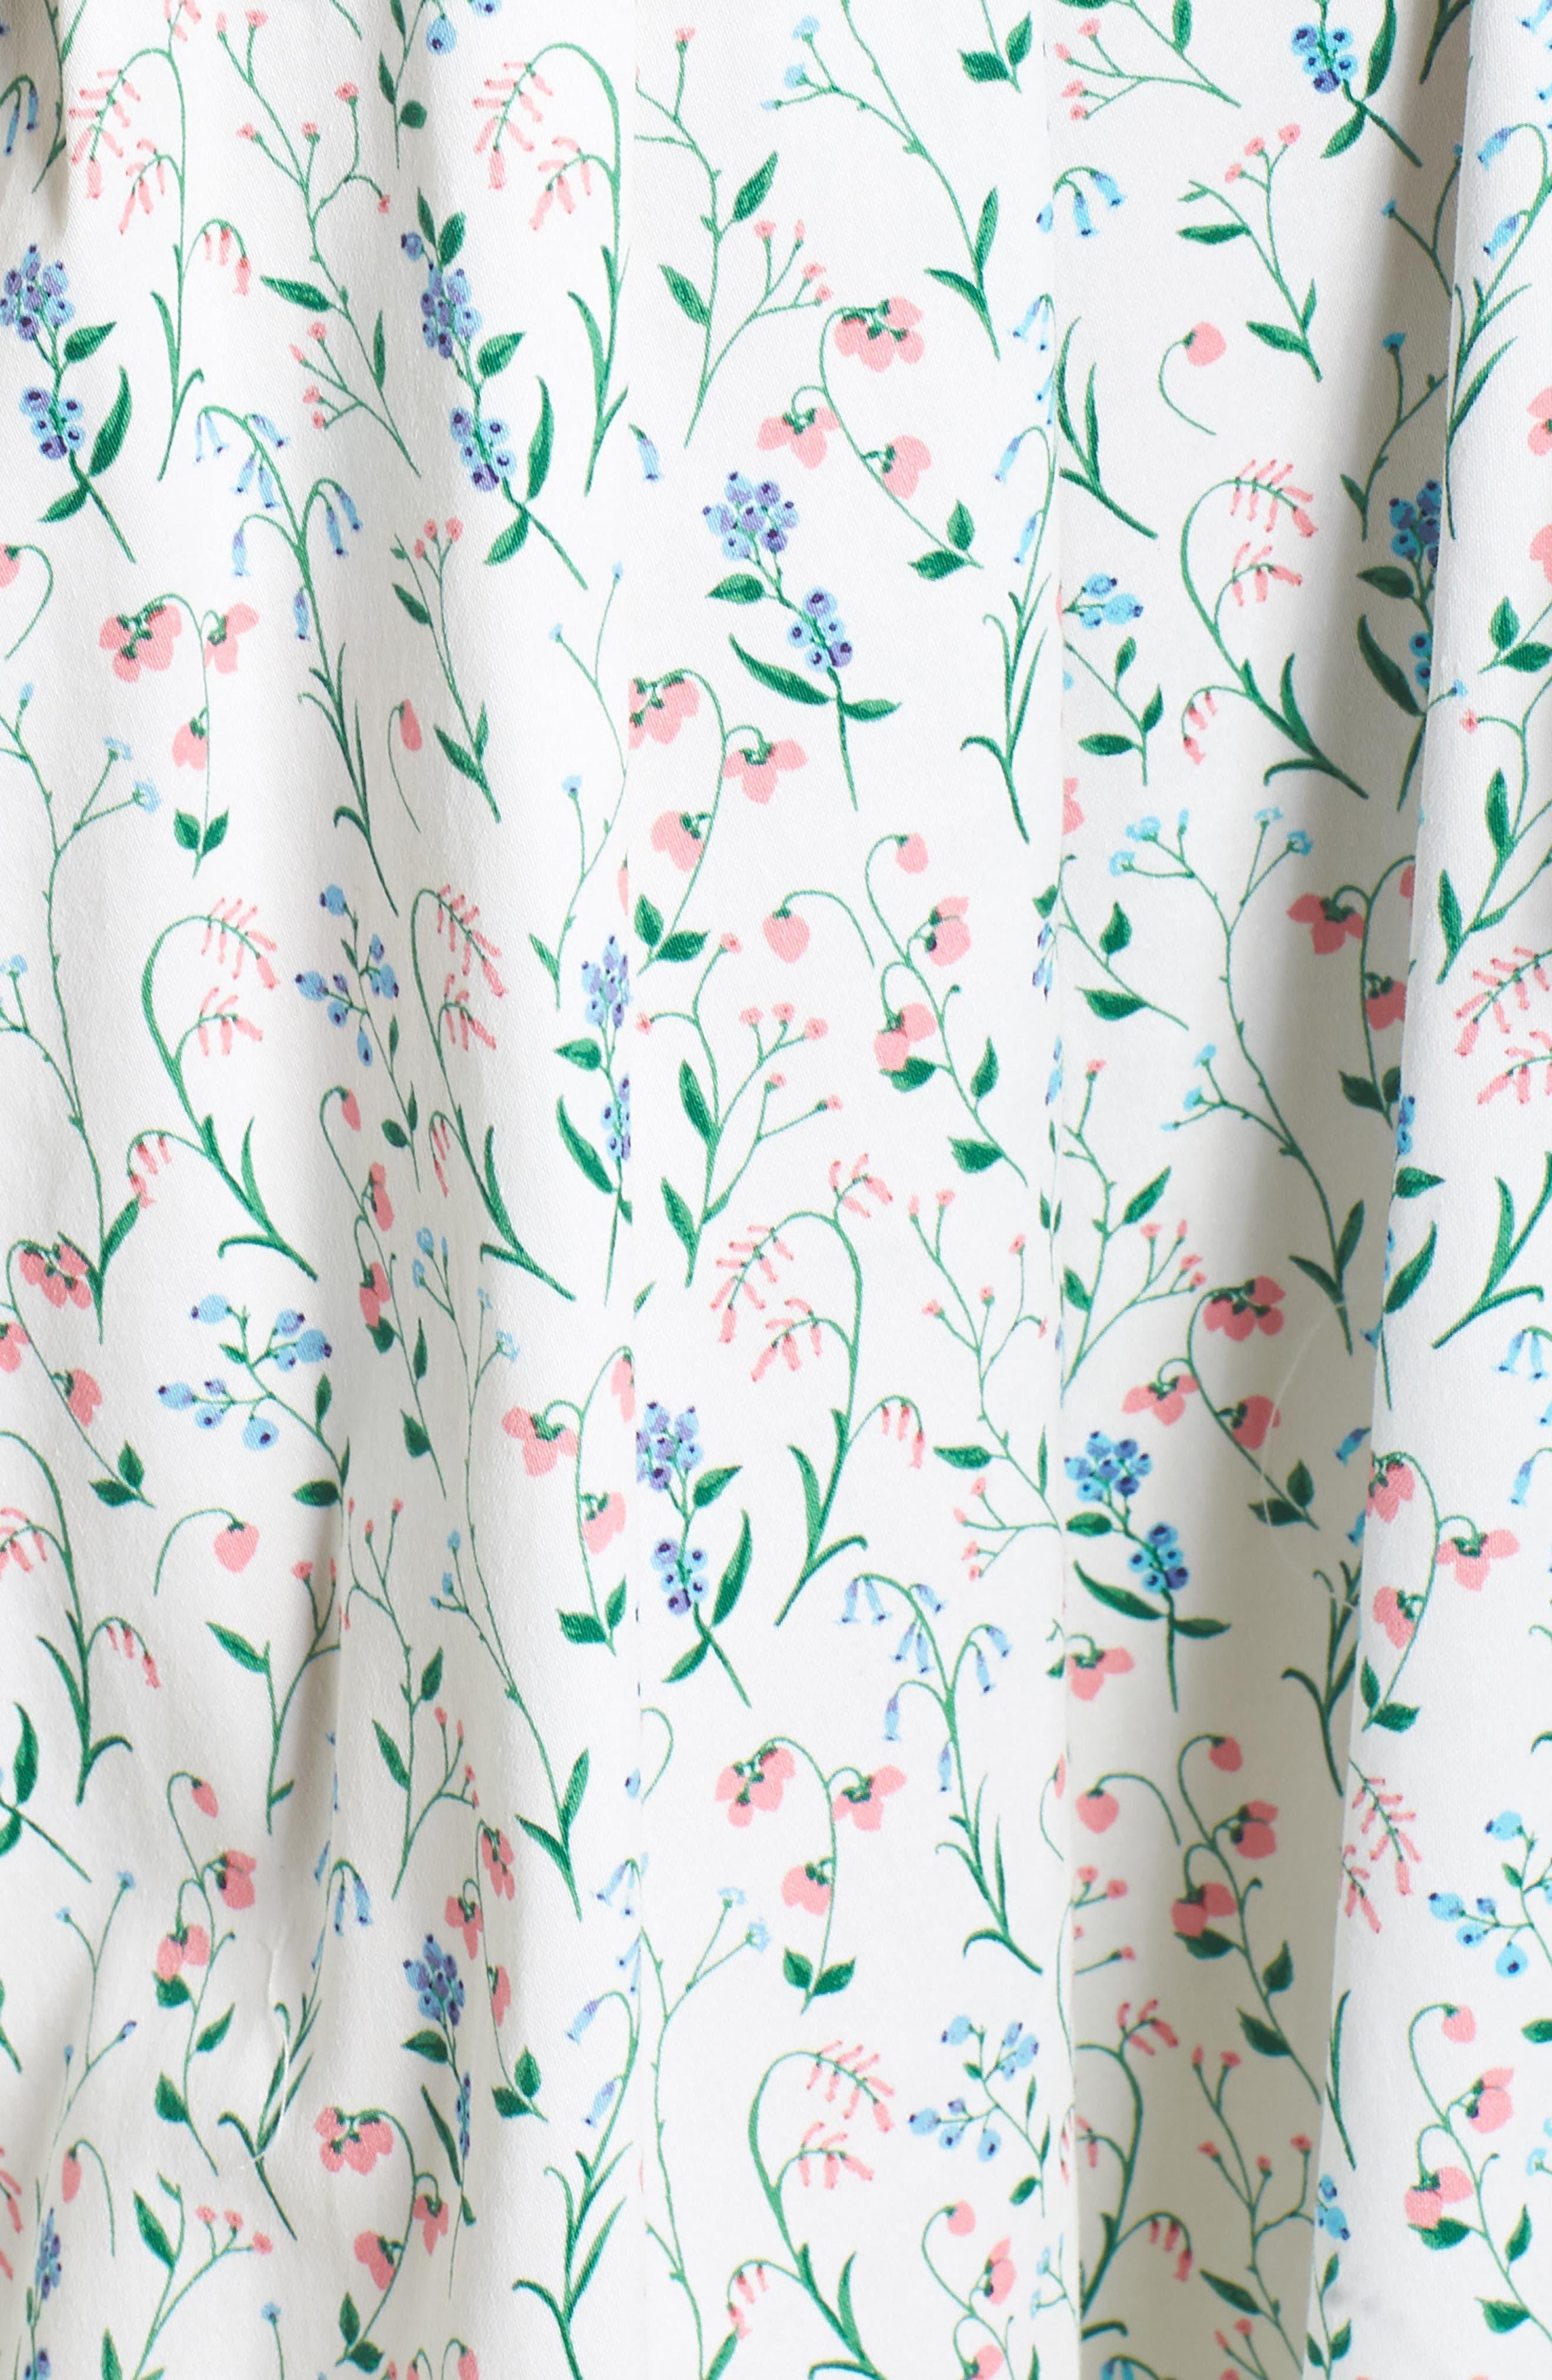 Anne Spring Sprig Print Wrap Style Dress,                             Alternate thumbnail 7, color,                             Pink